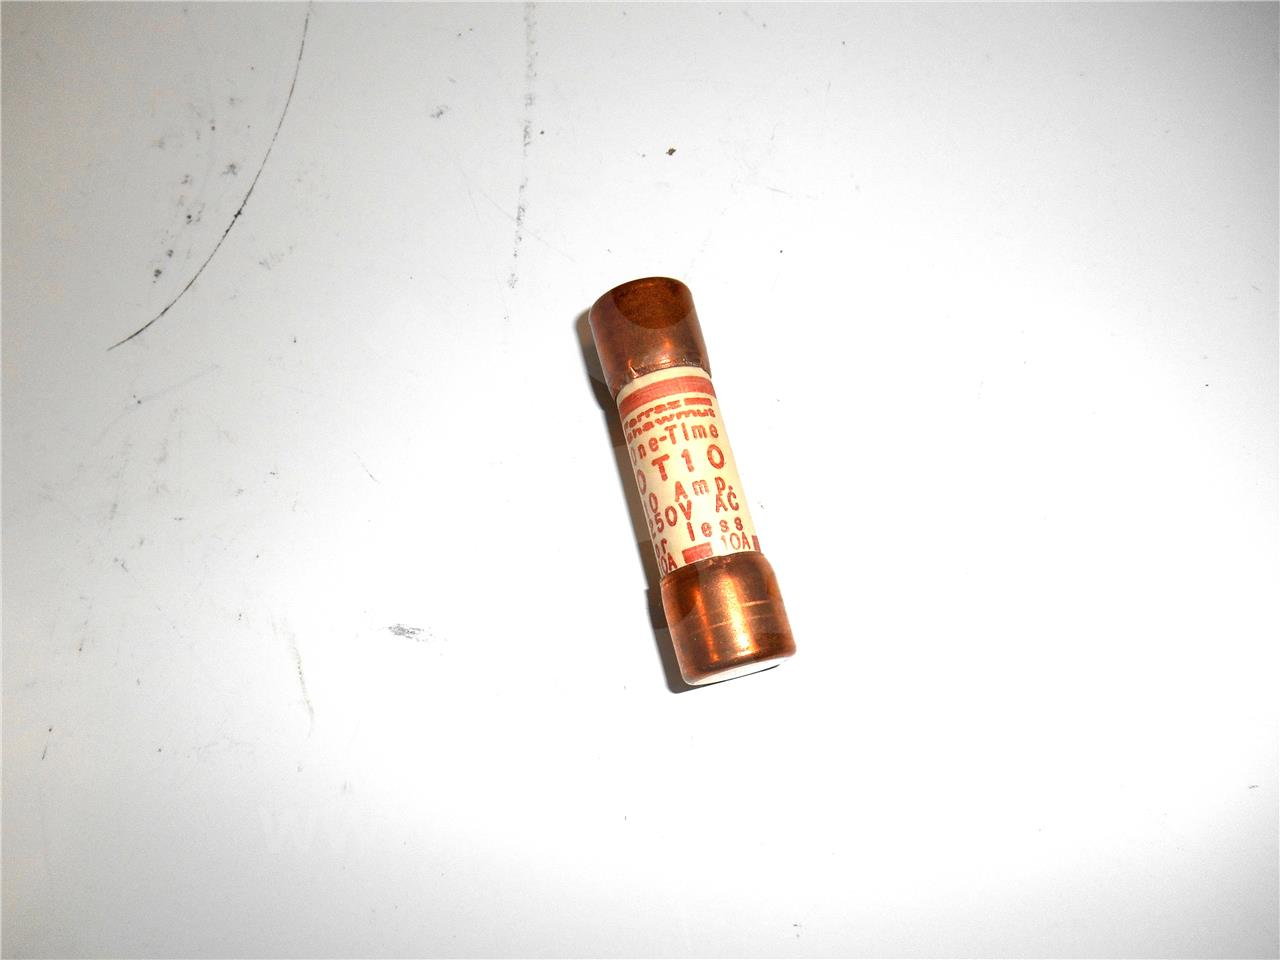 SHAWMUT 10A SHAWMUT CURRENT LIMITING FUSE, 250 VOLT